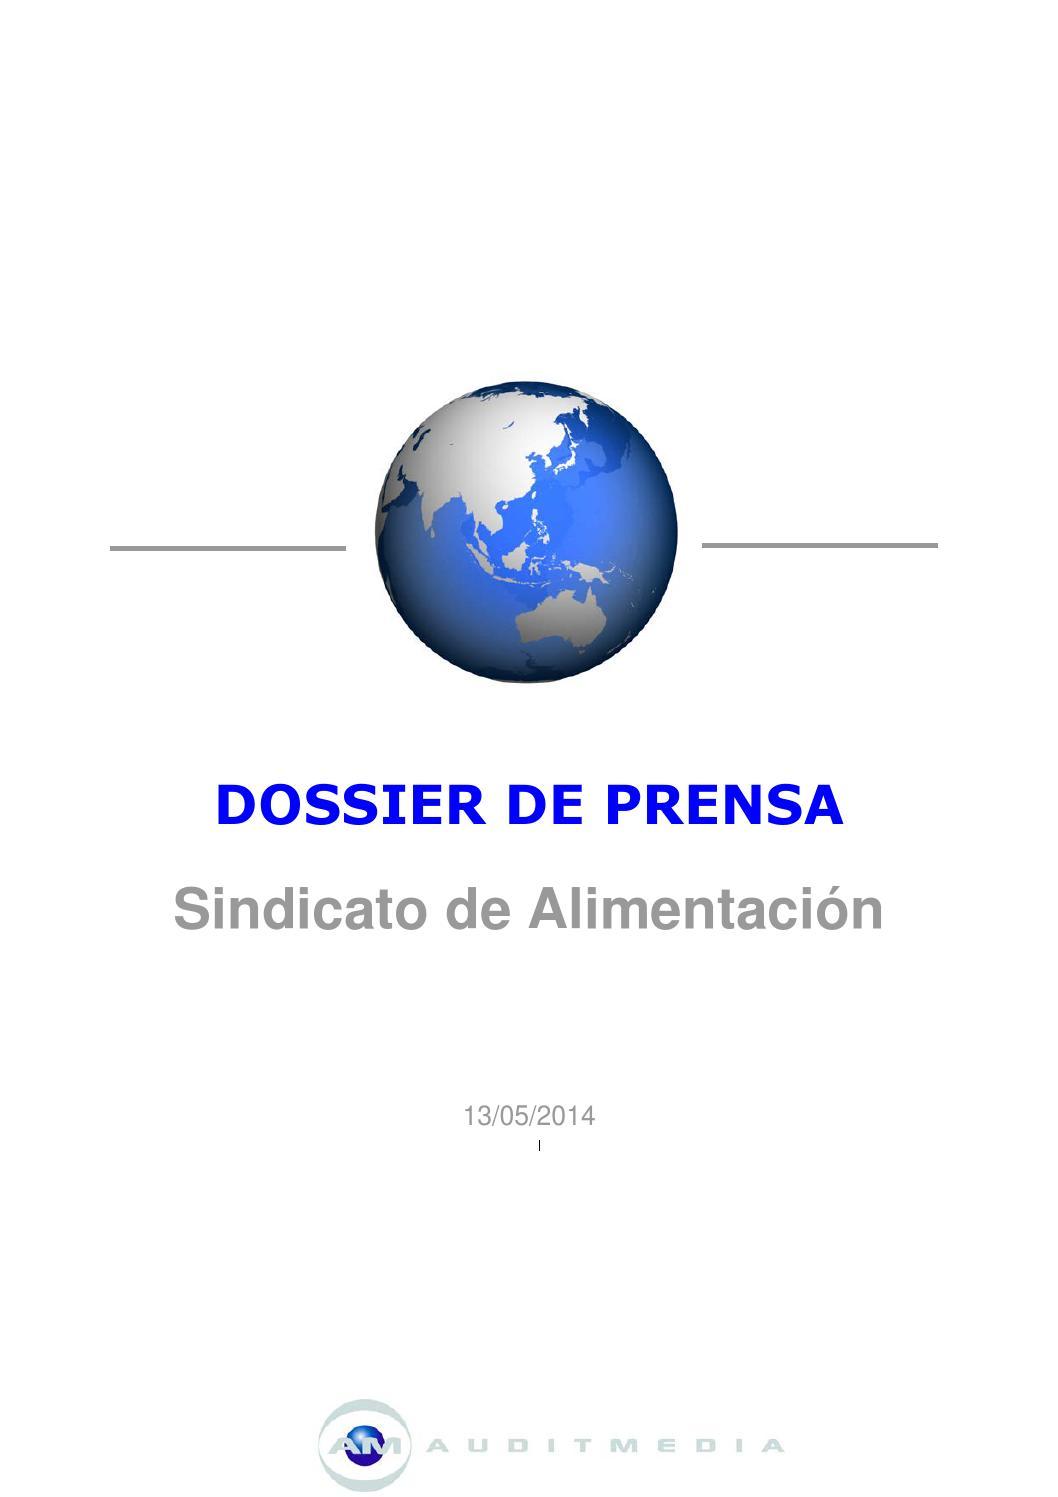 Demo12 05 14 by Marcos Juan - issuu